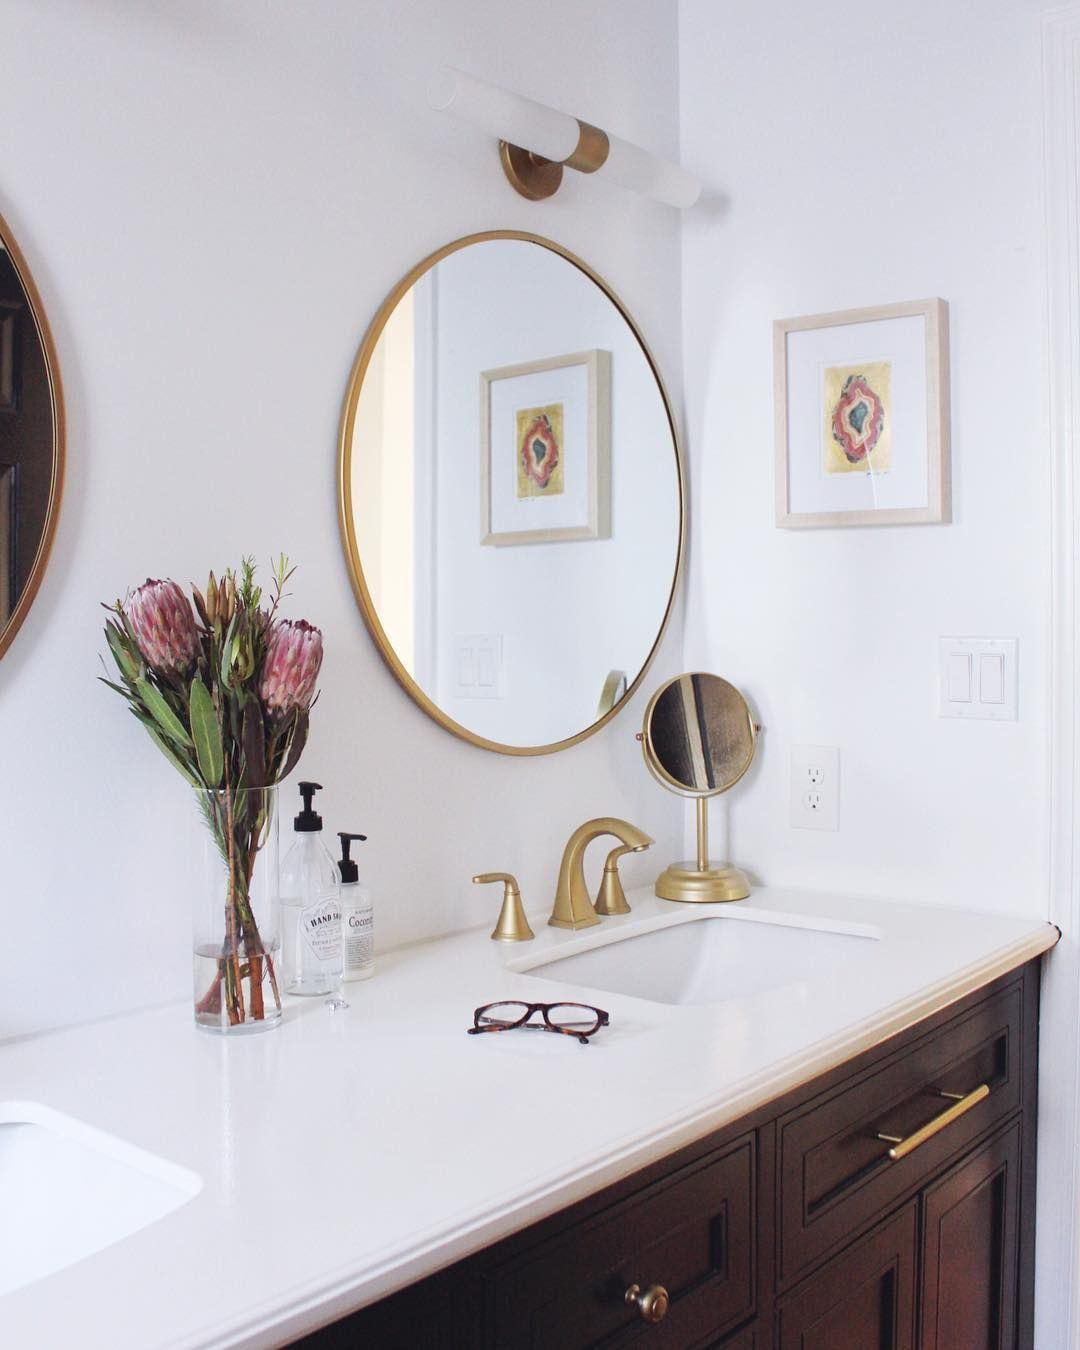 George Kovacs Light Used In Bathroom Of Goldalamode Soften The Look Of Your Bathroom Lighting Wh Bathroom Light Fixtures Led Bathroom Lights Bathroom Lighting George kovacs bathroom lighting